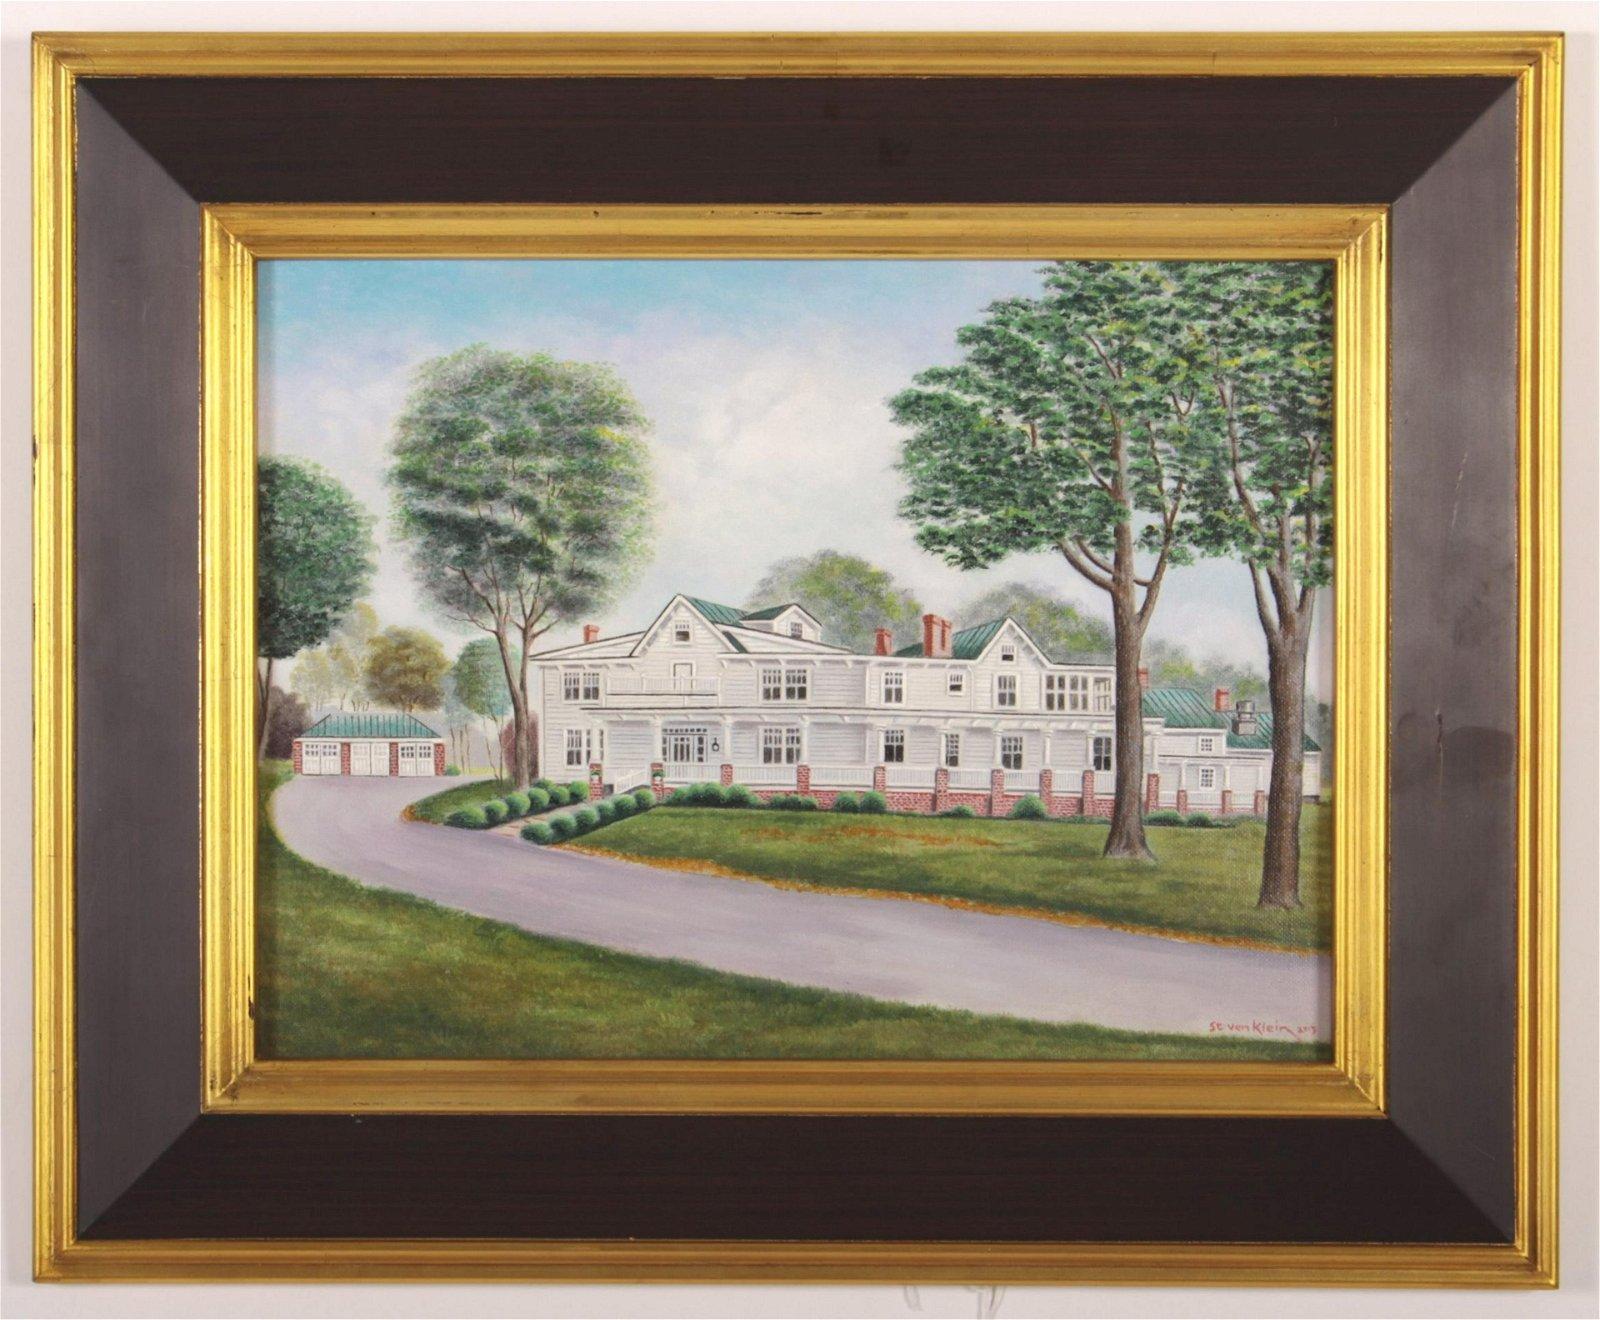 Steven Klein 20th c. A White House, Acrylic/Canvas